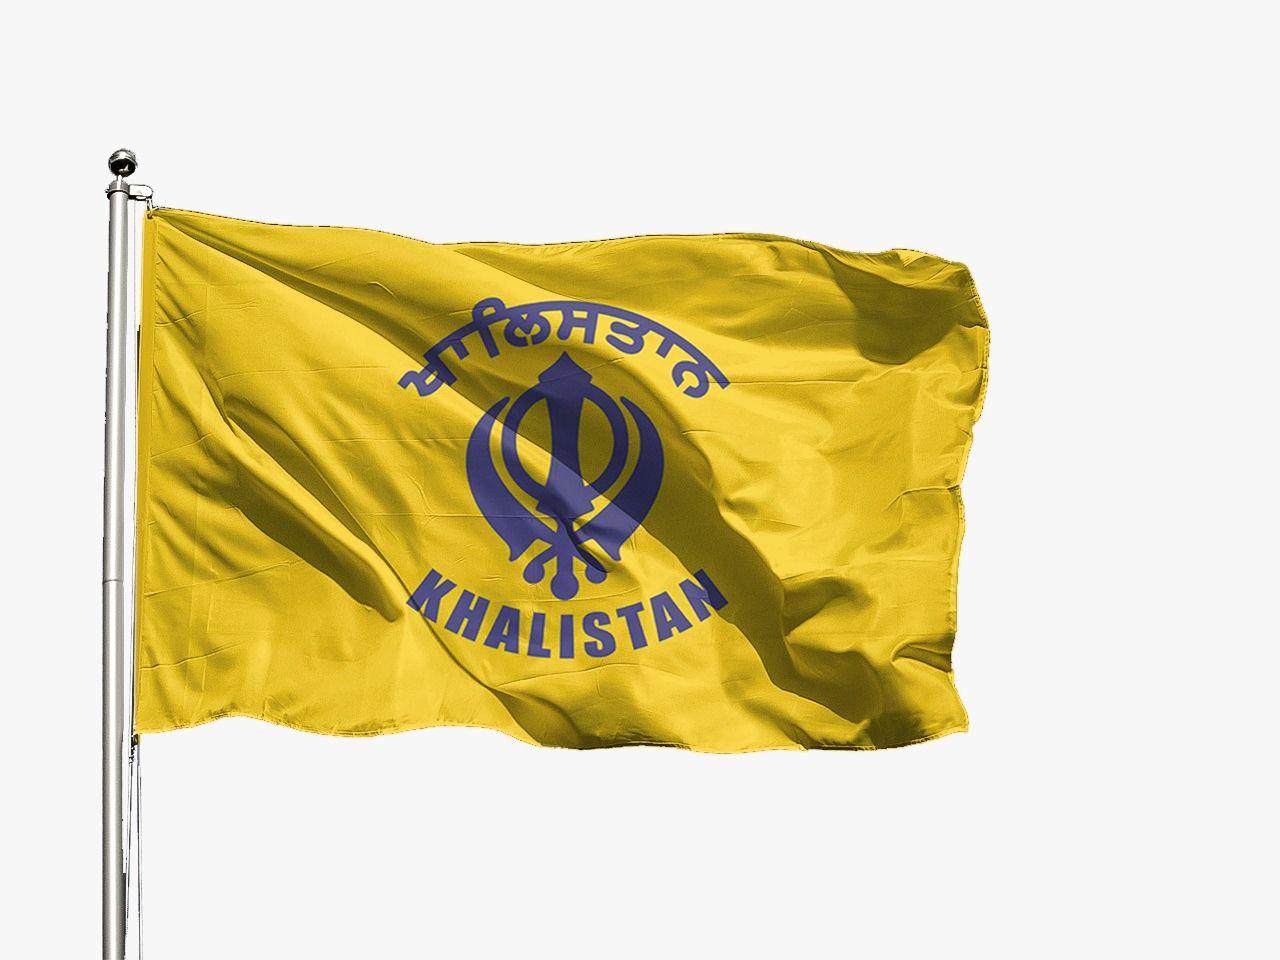 Pin By Khalistan Zindabad On Khalistan Flag Operation Blue Star Eagle Wallpaper Blue Star